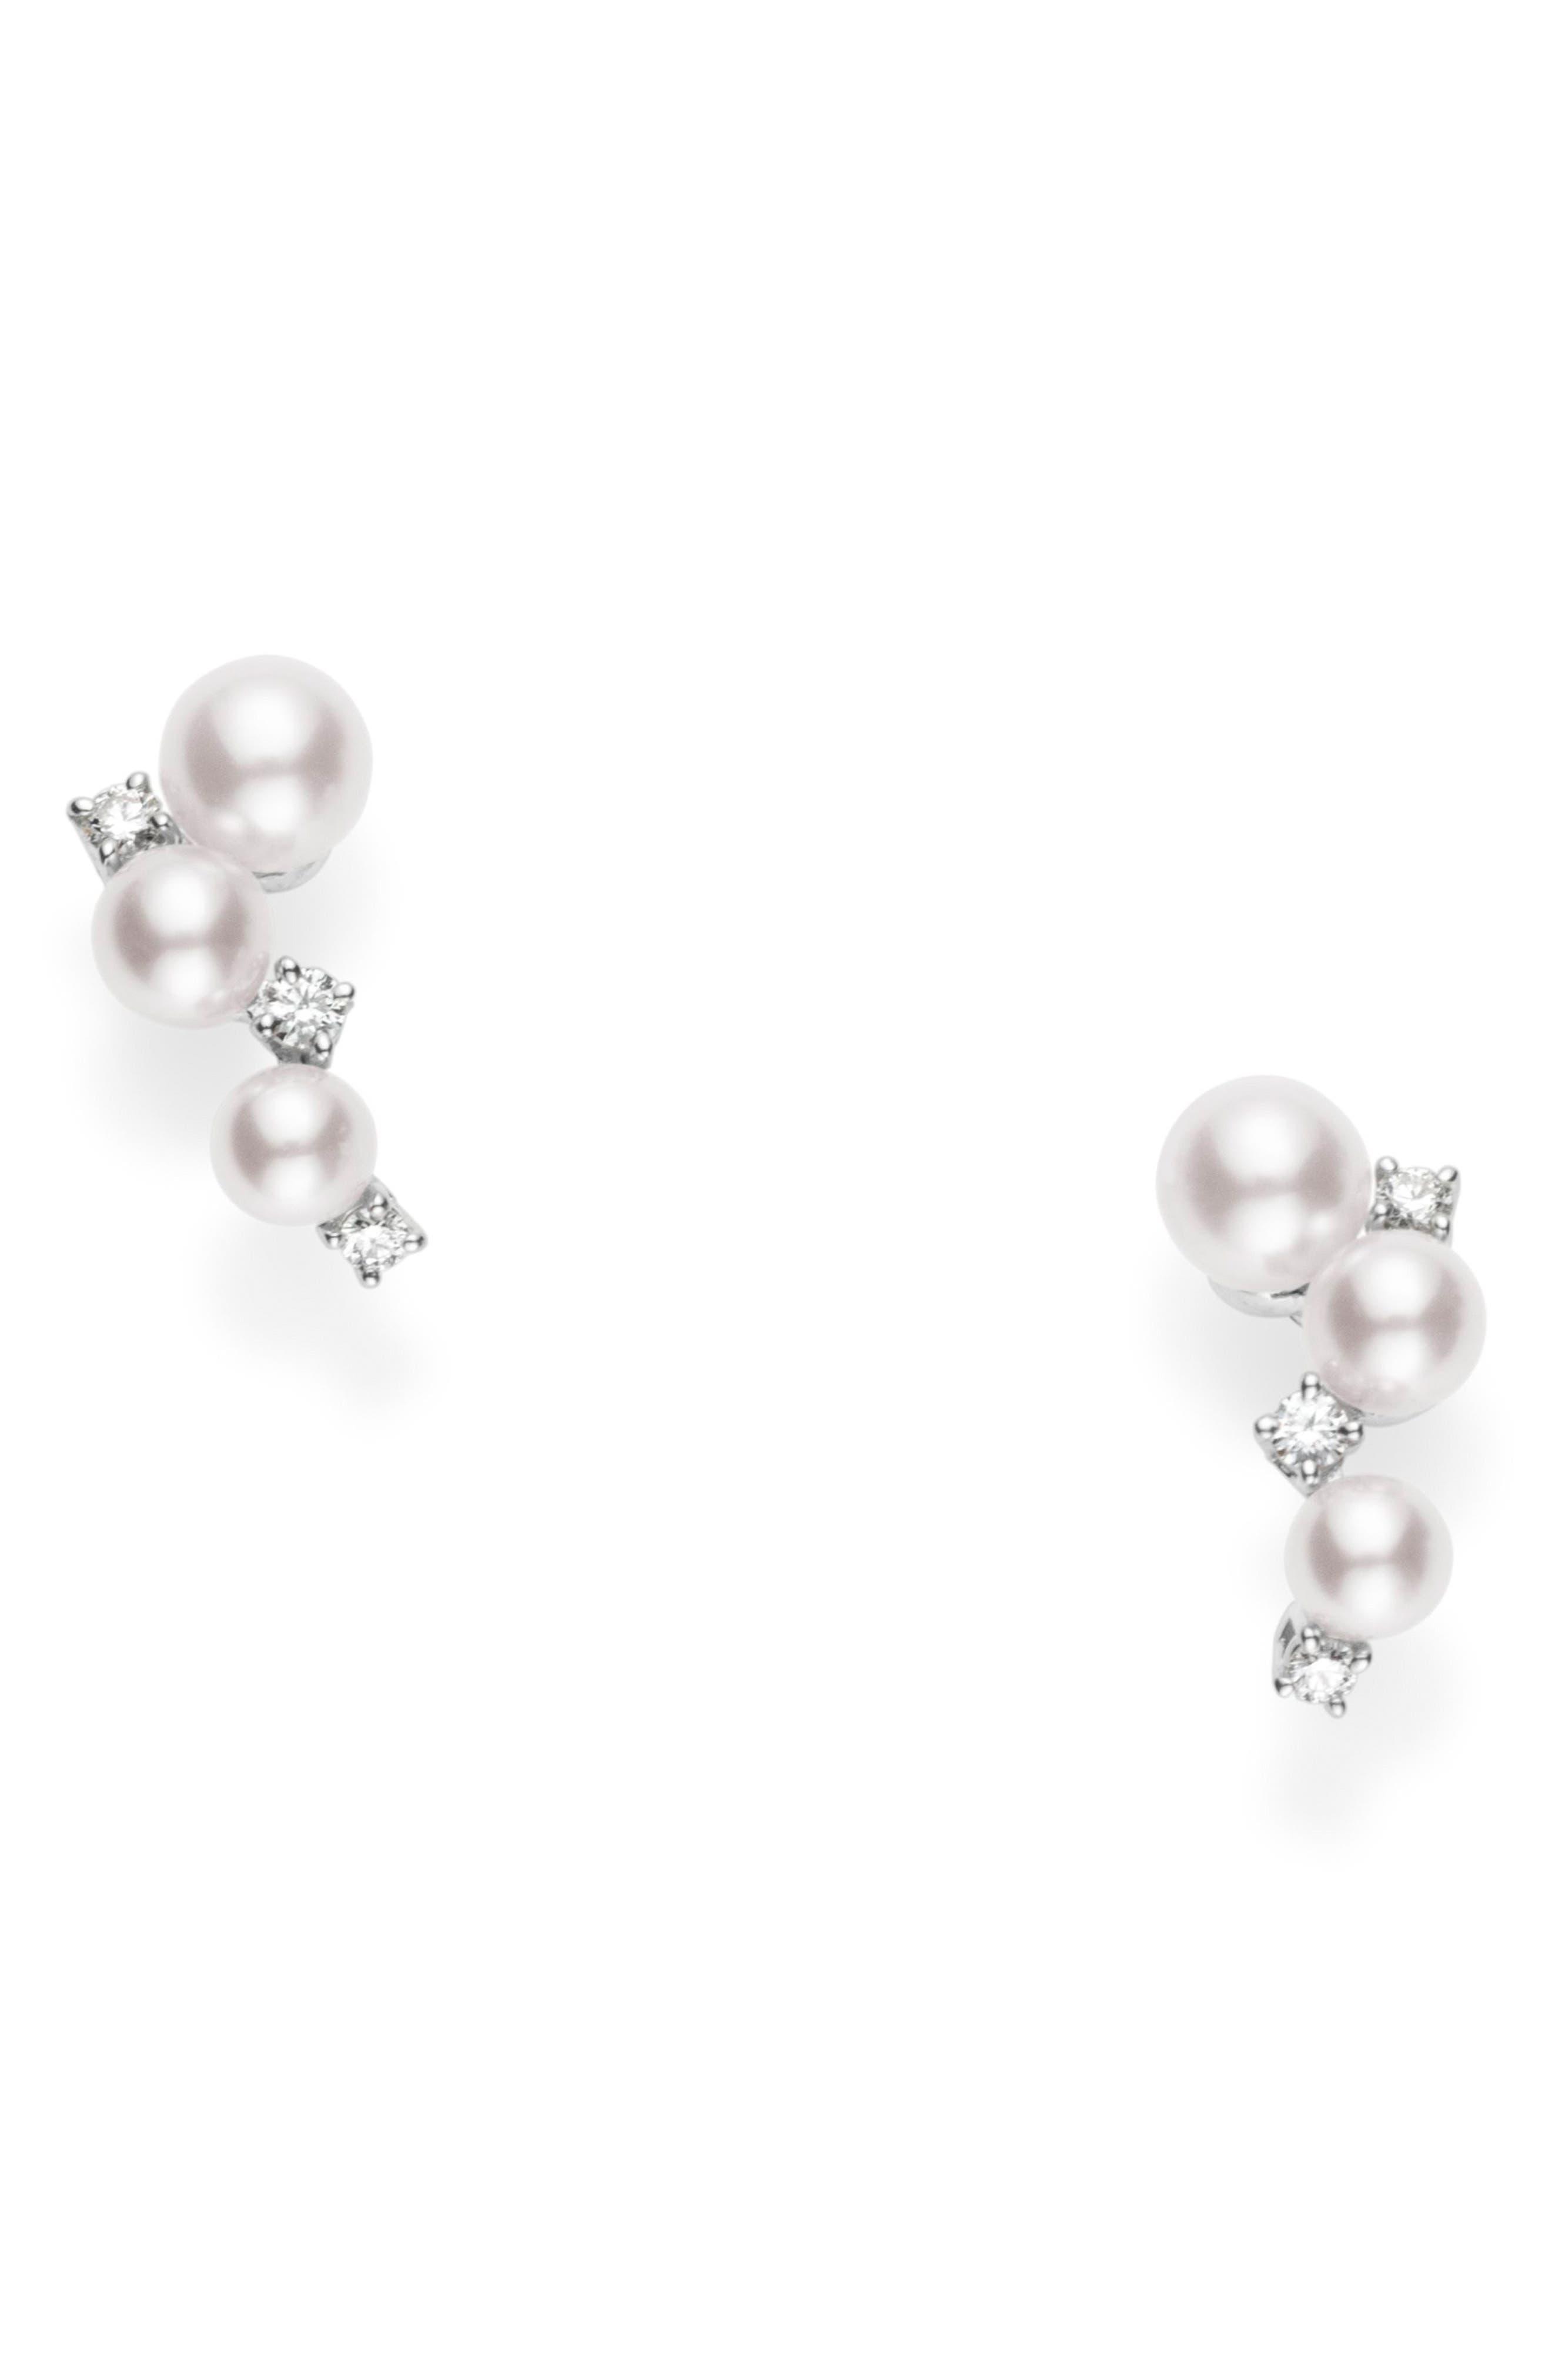 Main Image - Mikimoto Pearl & Diamond Cluster Earrings